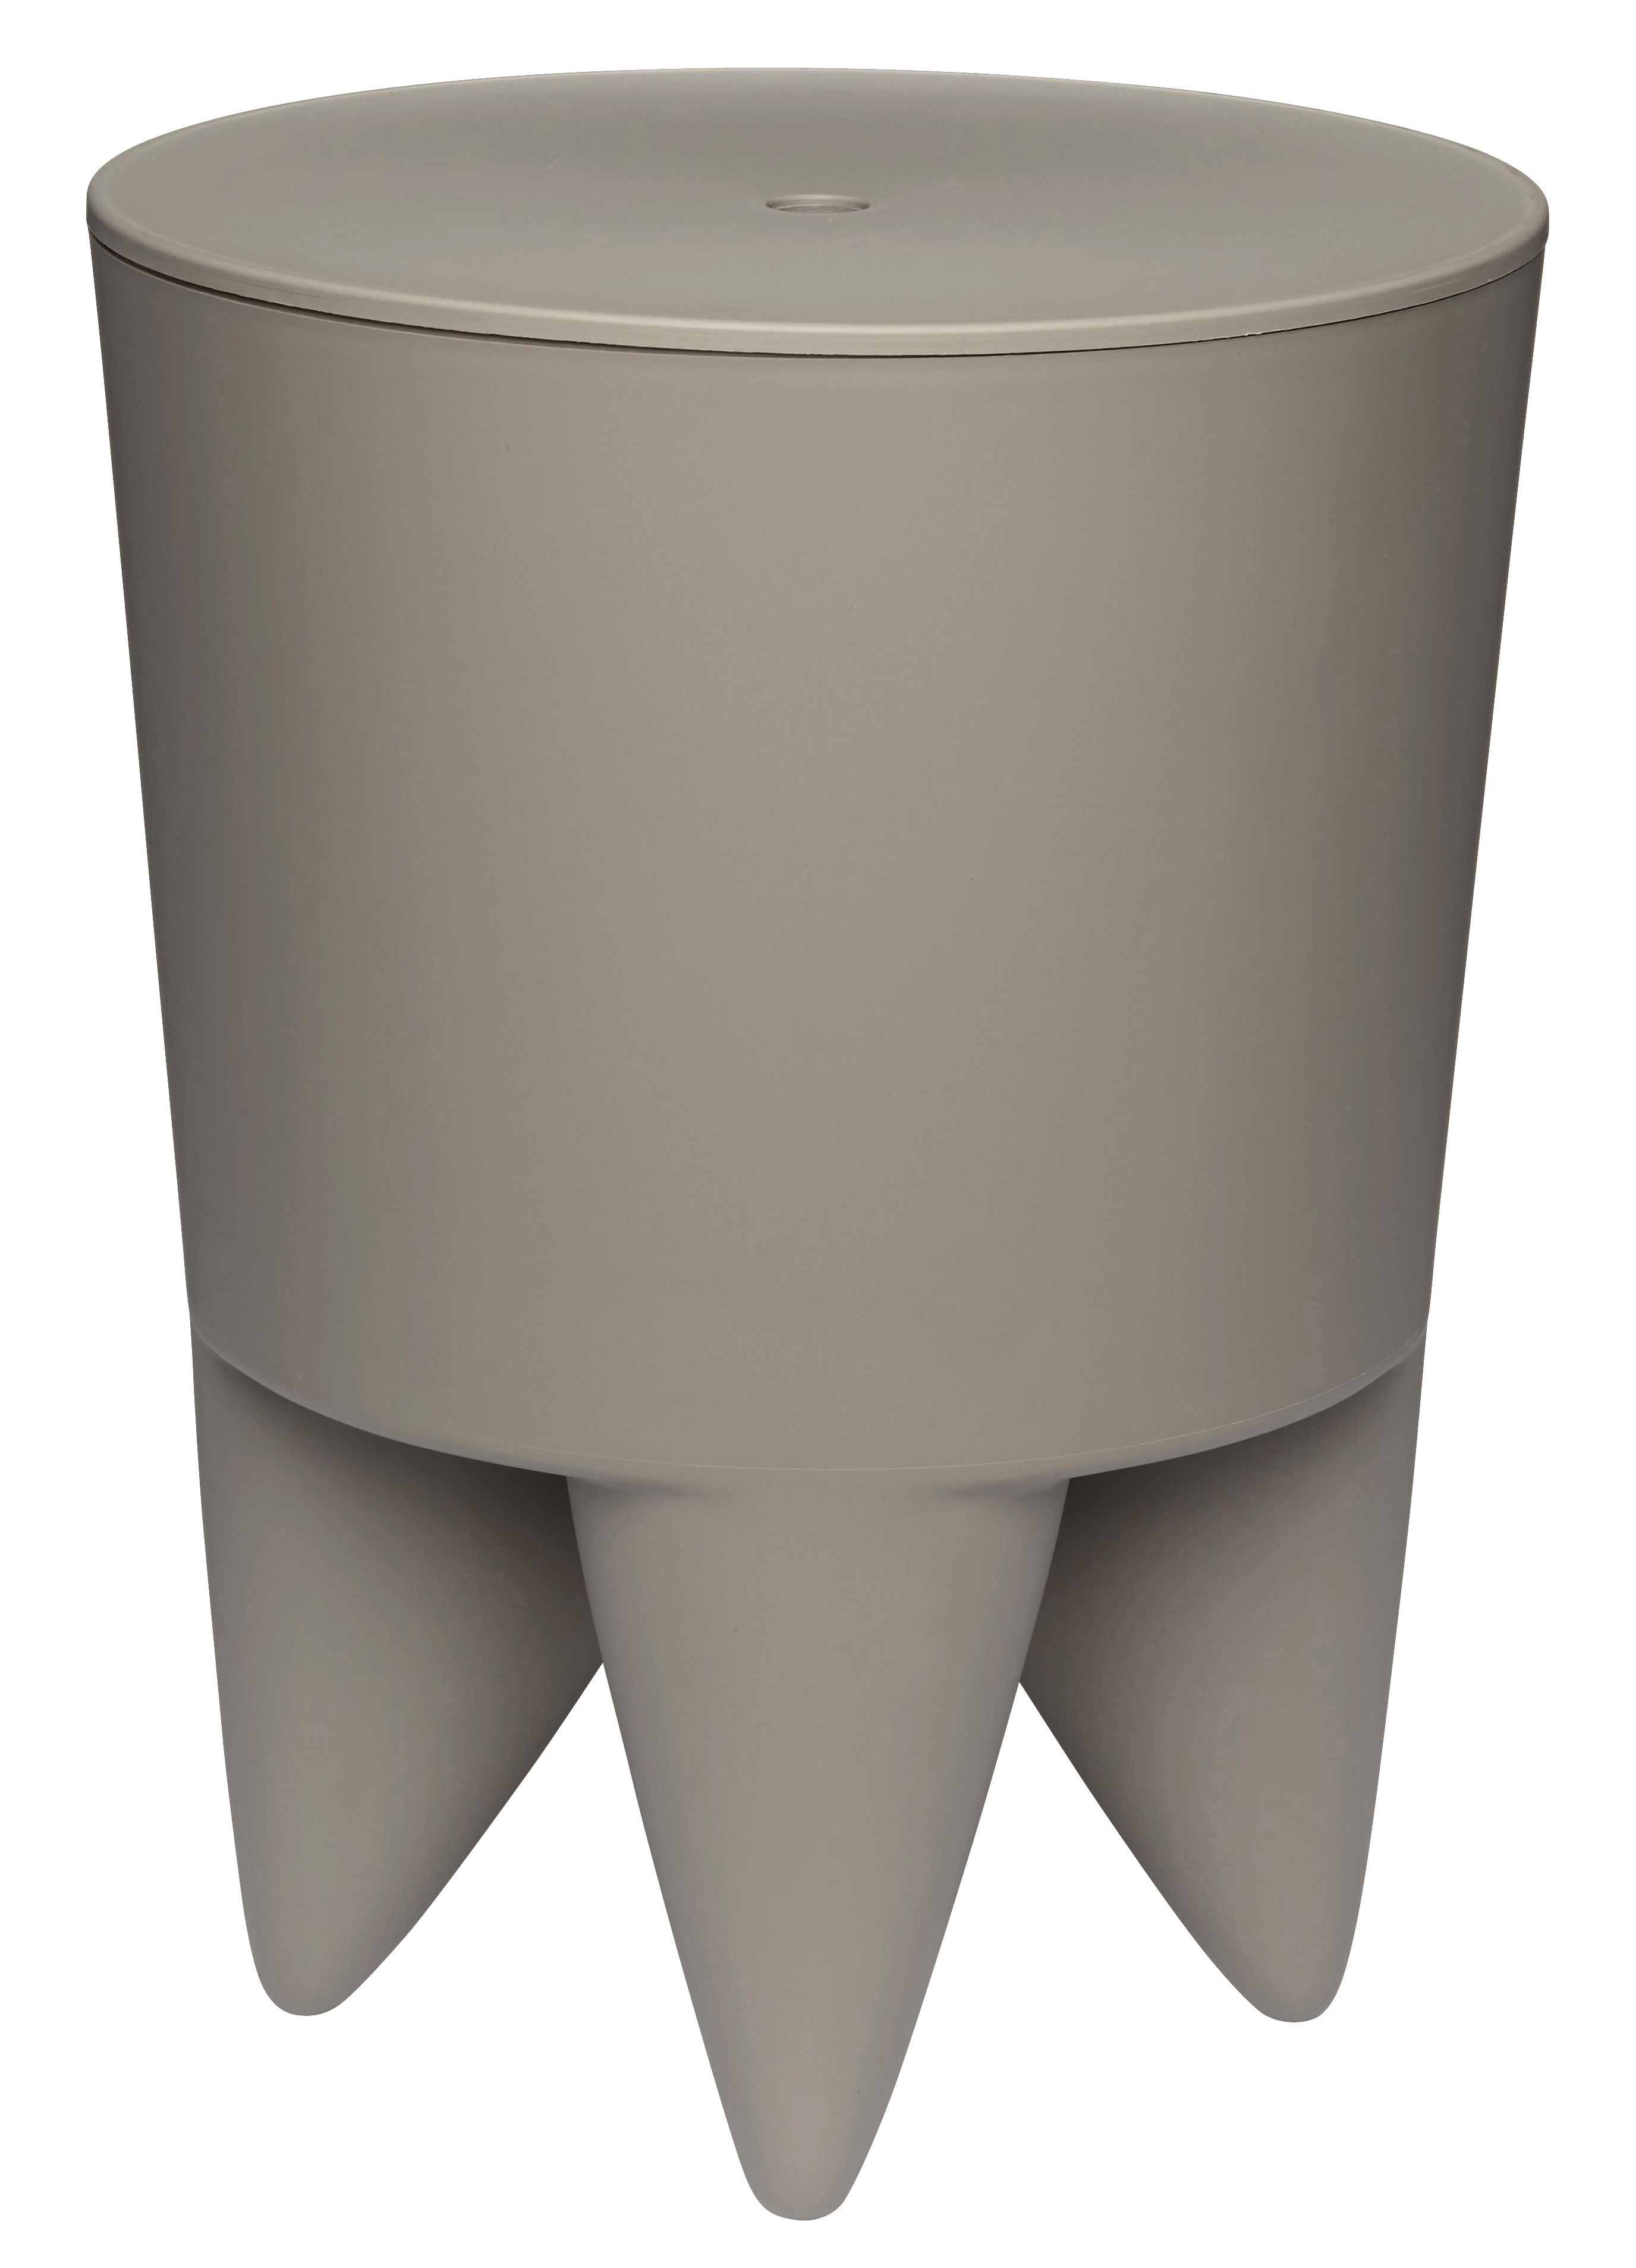 tabouret new bubu 1er coffre plastique gris taup xo. Black Bedroom Furniture Sets. Home Design Ideas